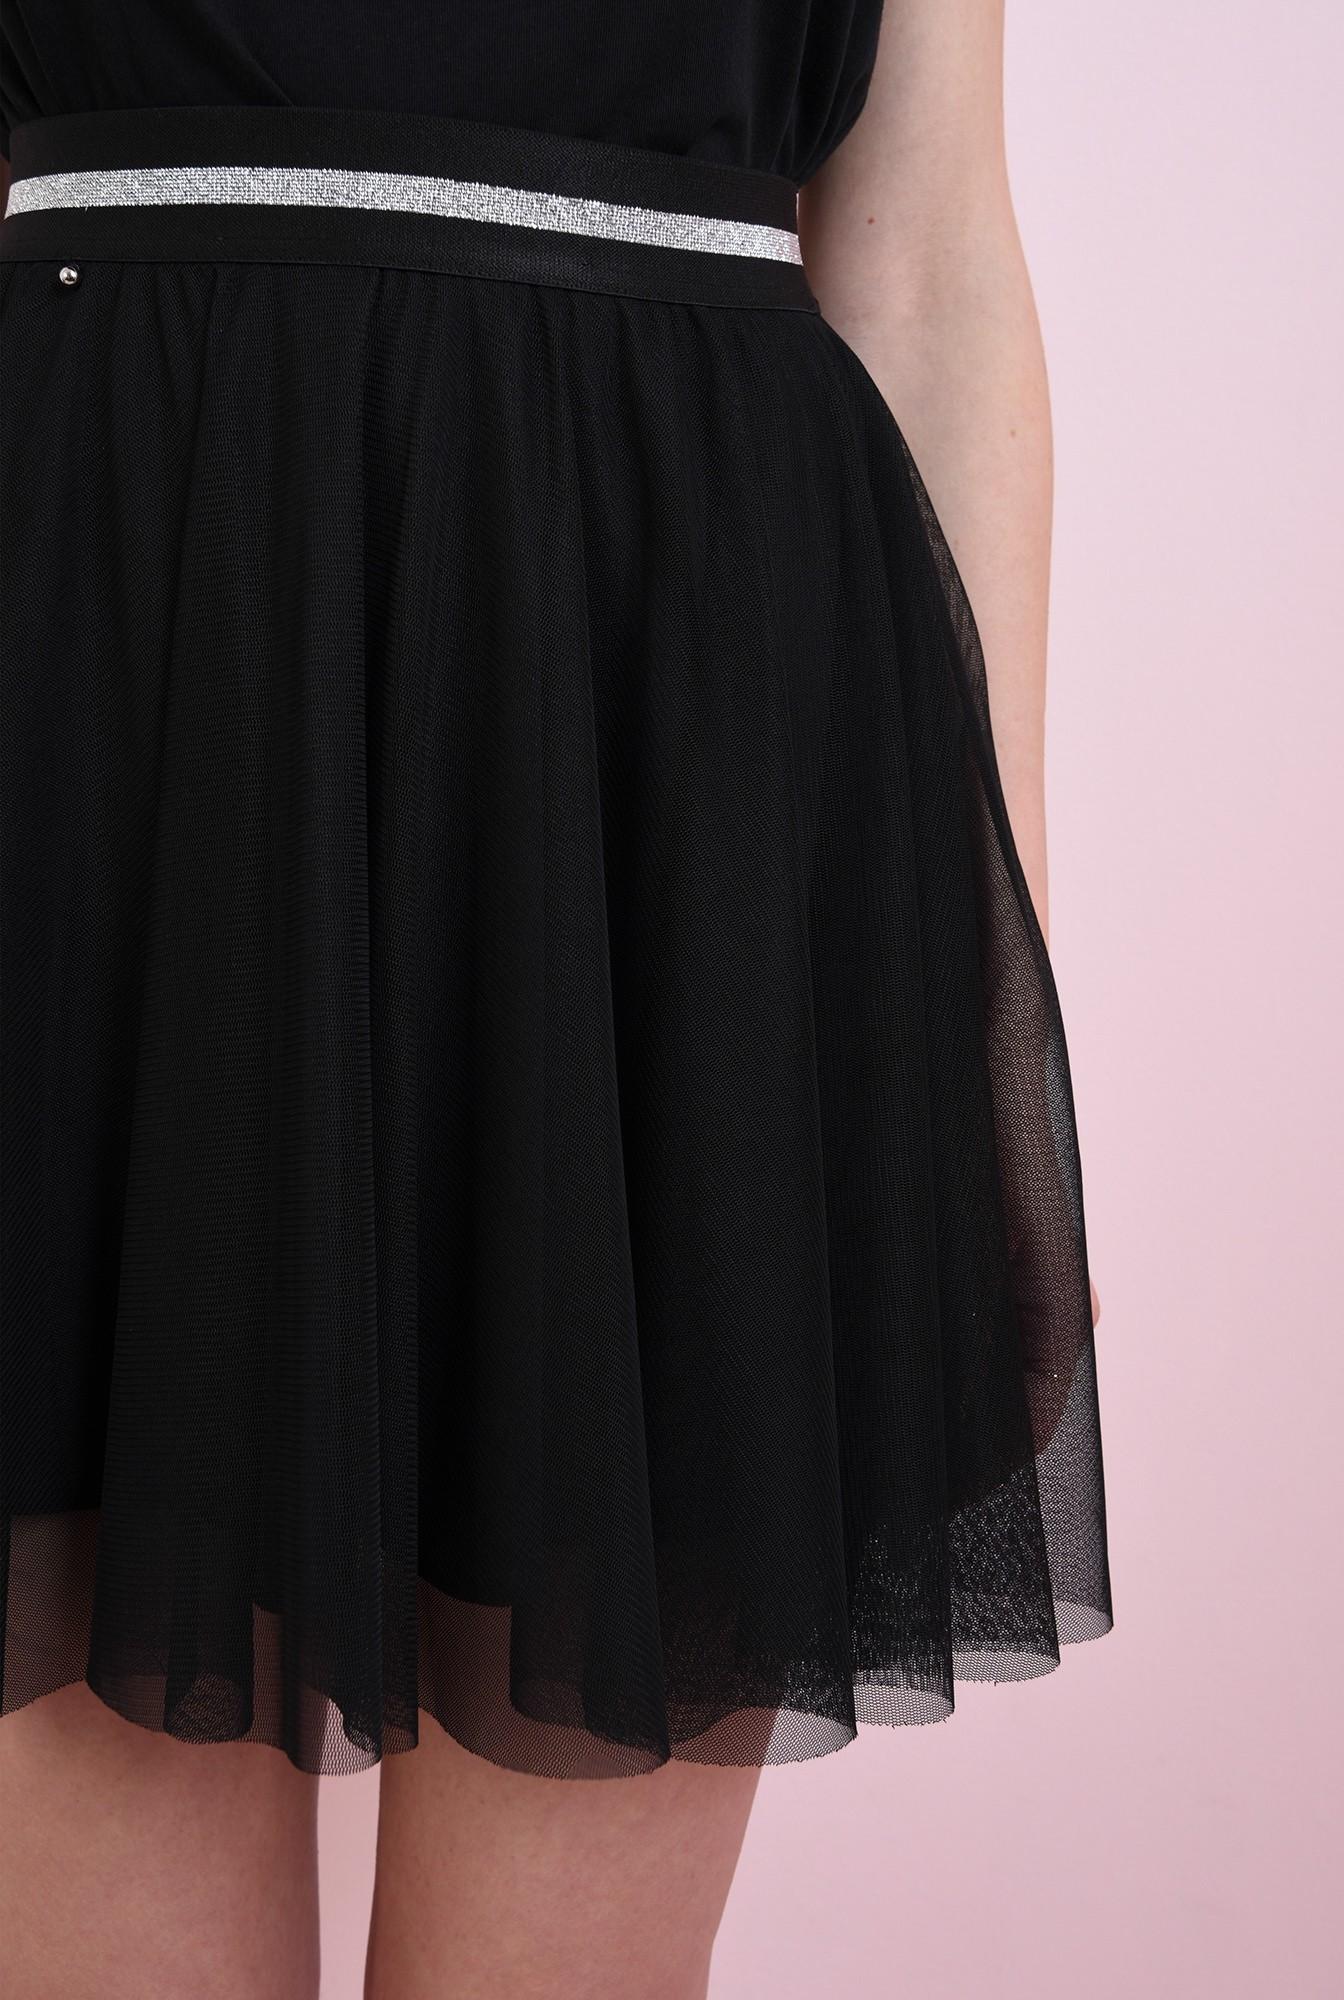 2 - fusta neagra, din tul, cu insertie glitter la talie